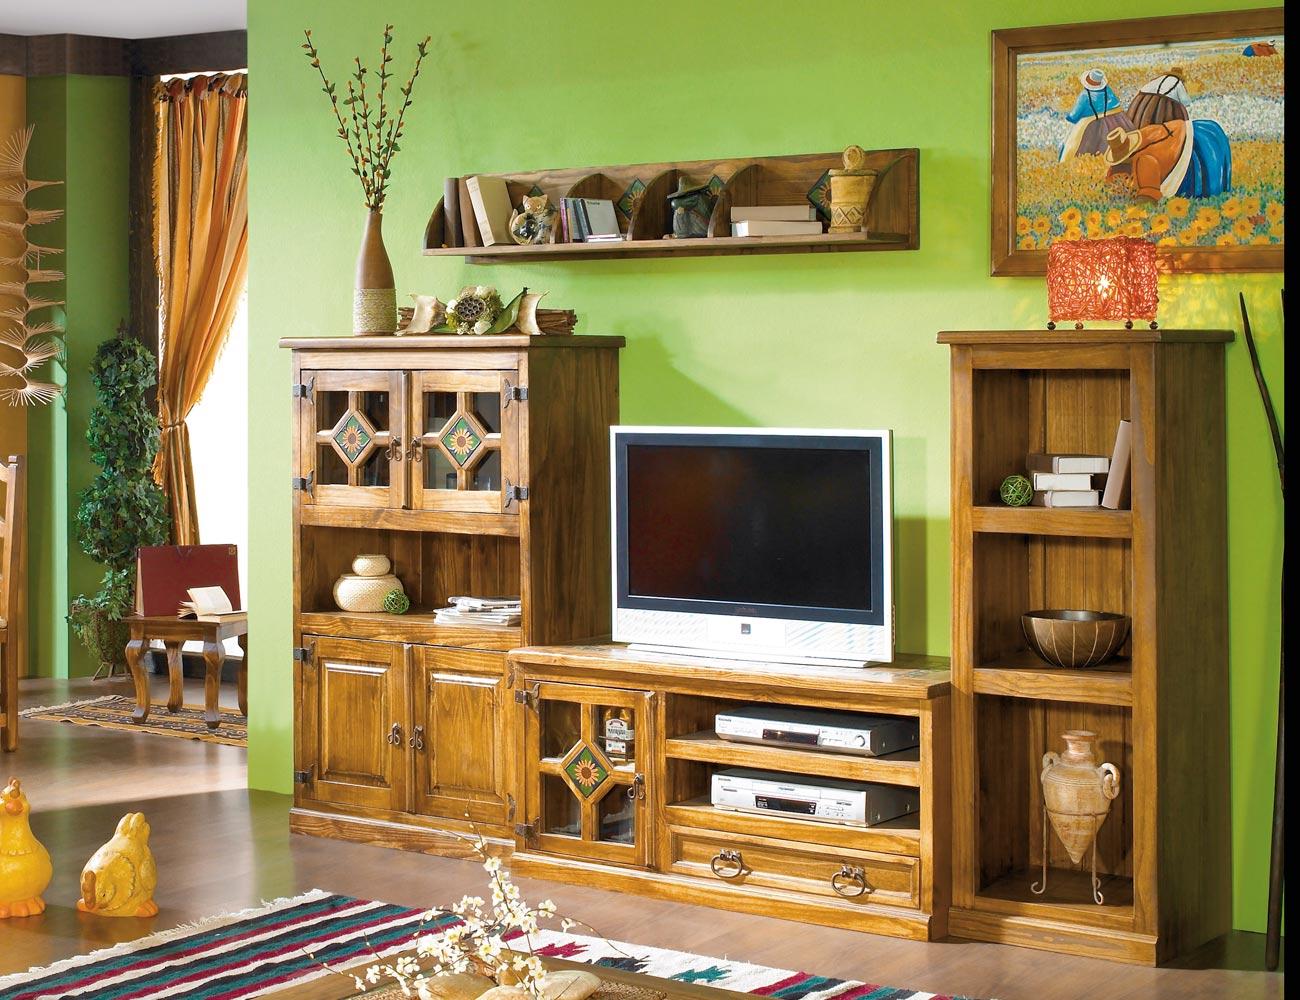 Mueble salon comedor madera jalisco girasol 265